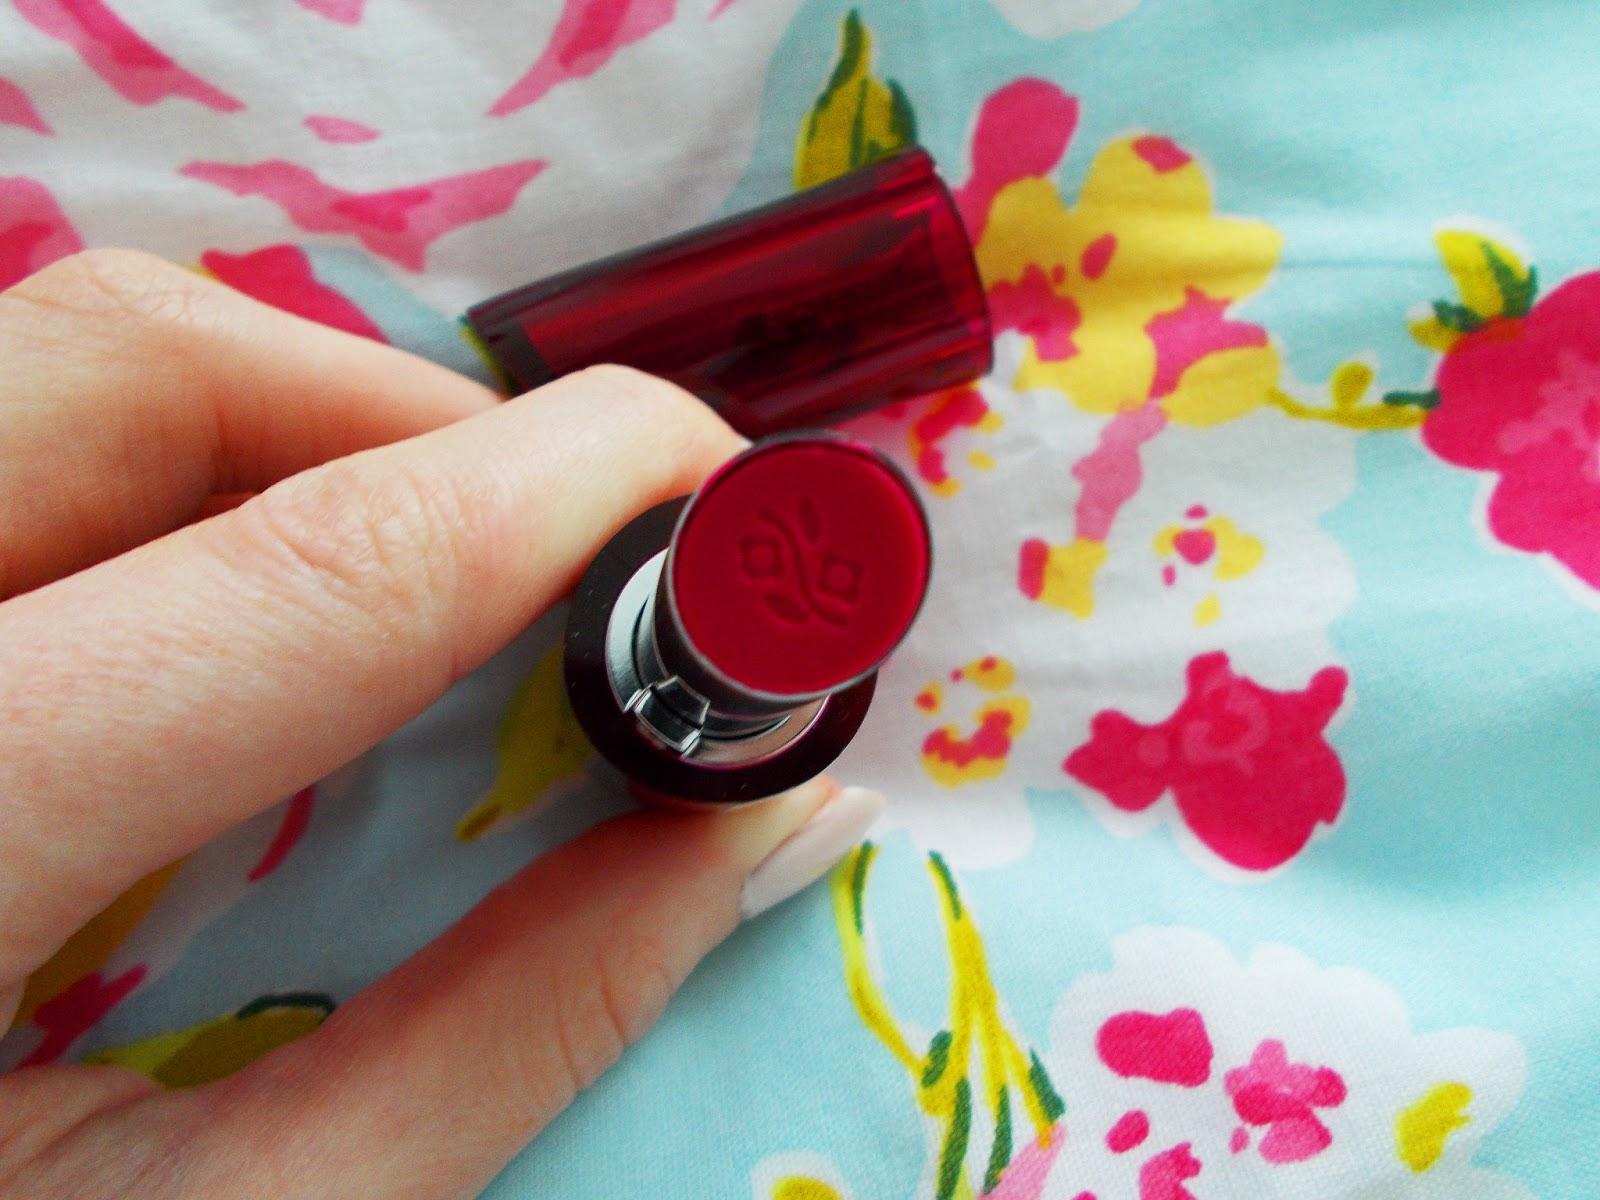 Deborah Milano Shine Creator Lipstick